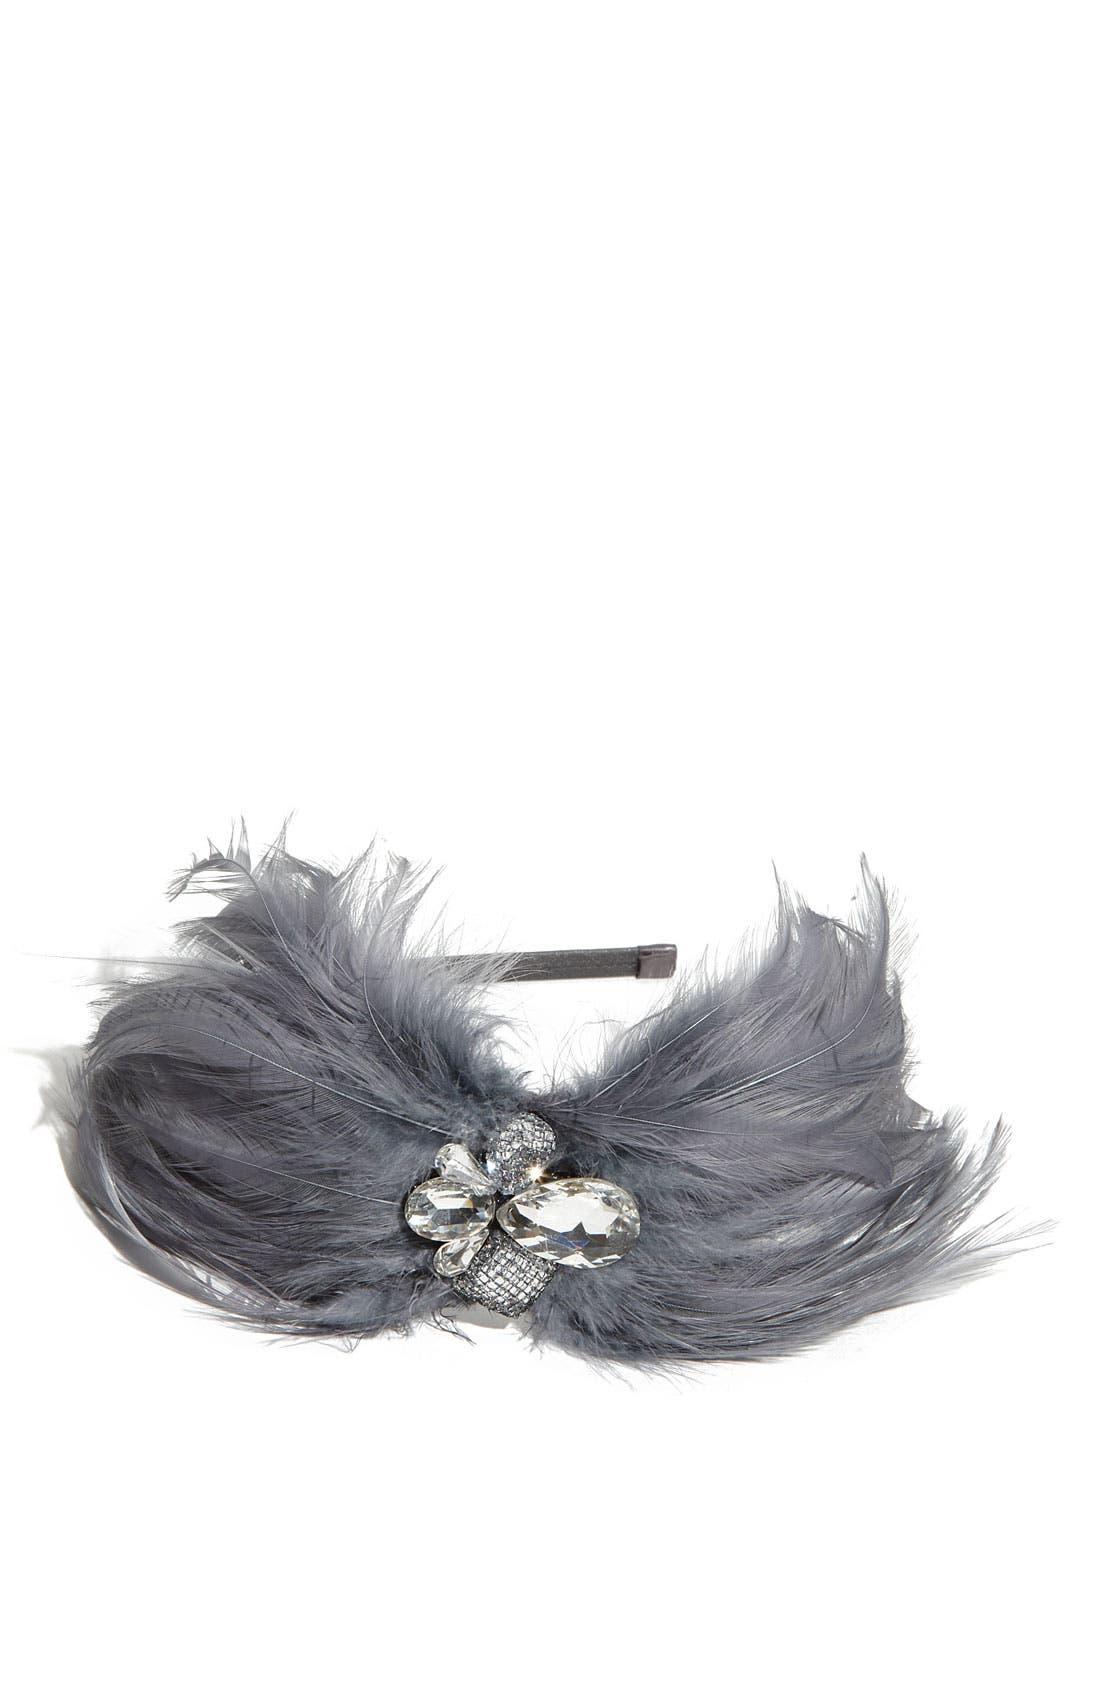 Alternate Image 1 Selected - Tasha 'Dreamy Bird' Fascinator Headband